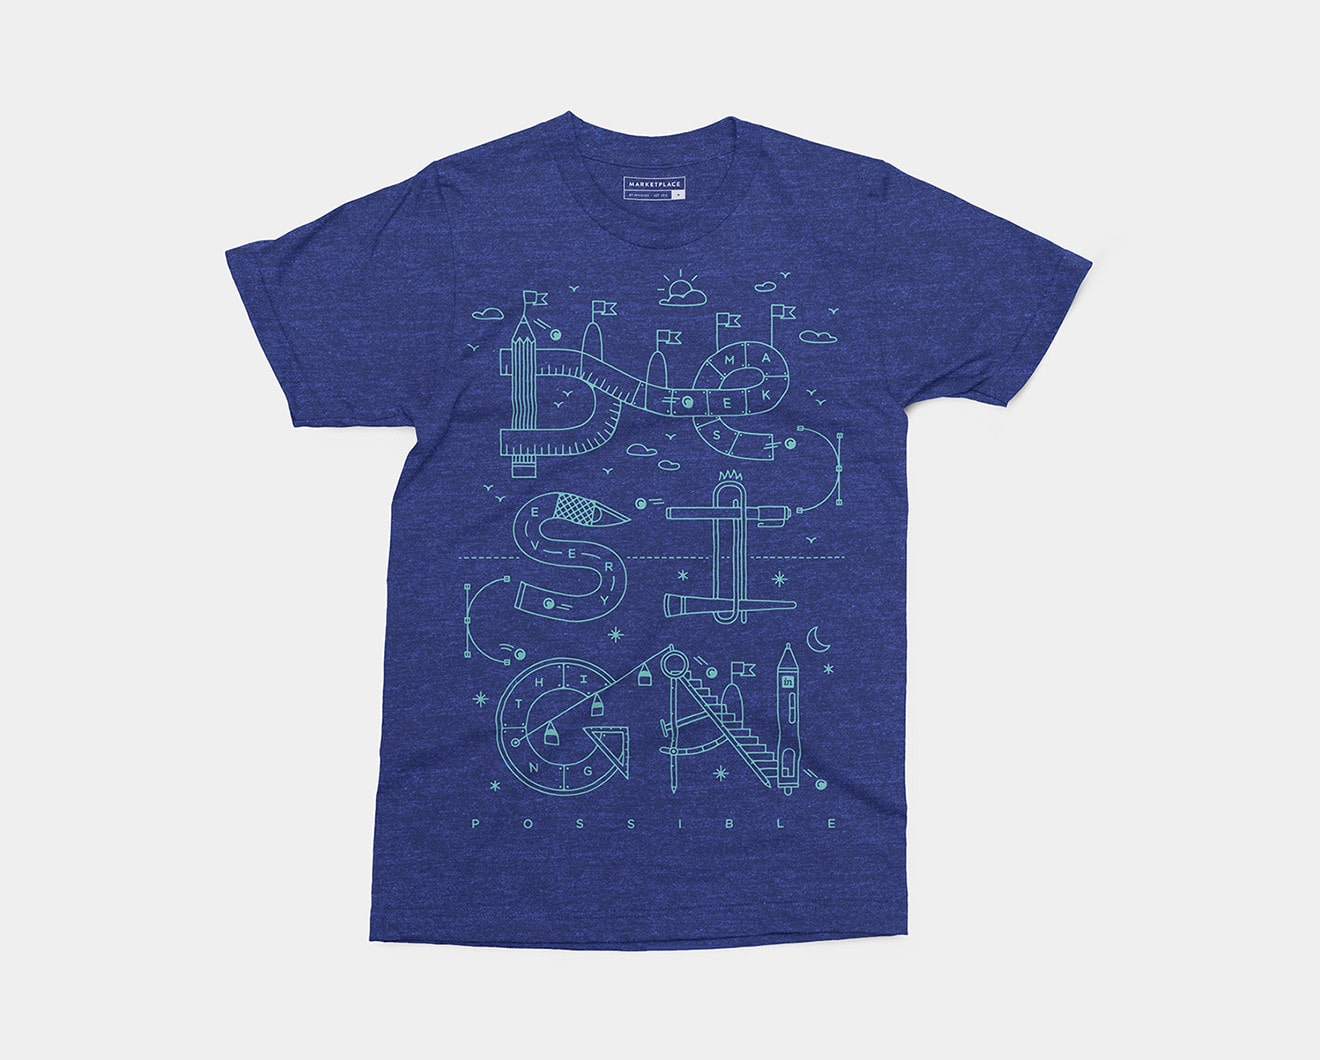 T shirt design york pa - Design Makes Everything Possible Gerren Lamson